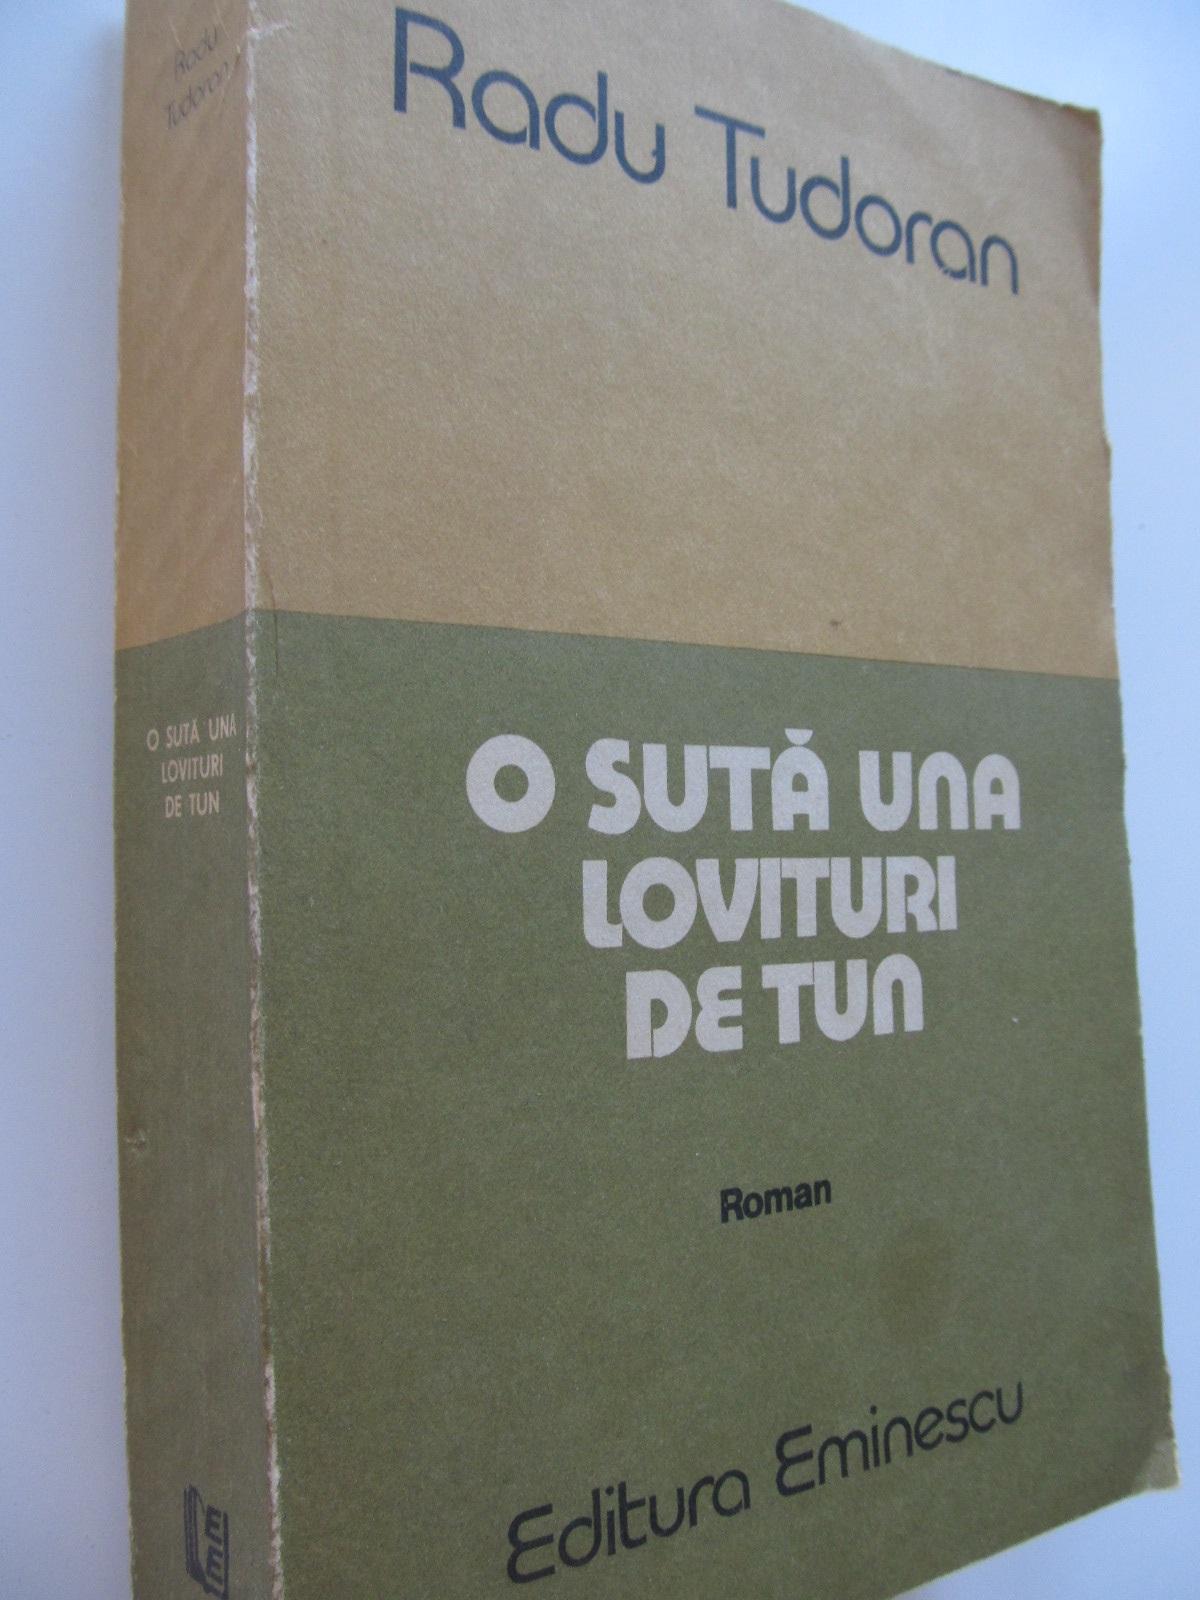 O suta una lovituri de tun - Radu Tudoran | Detalii carte